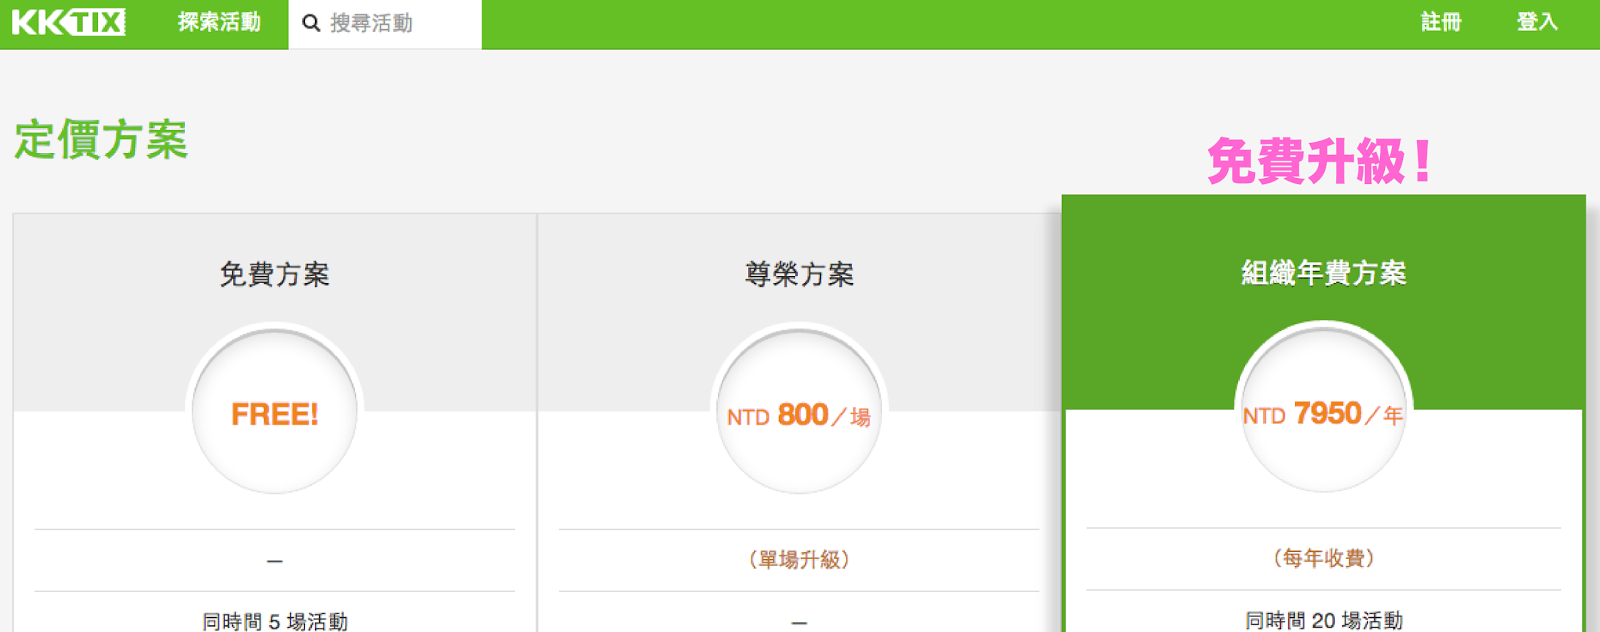 FLOSS 社群免費升級KKTIX年約用戶